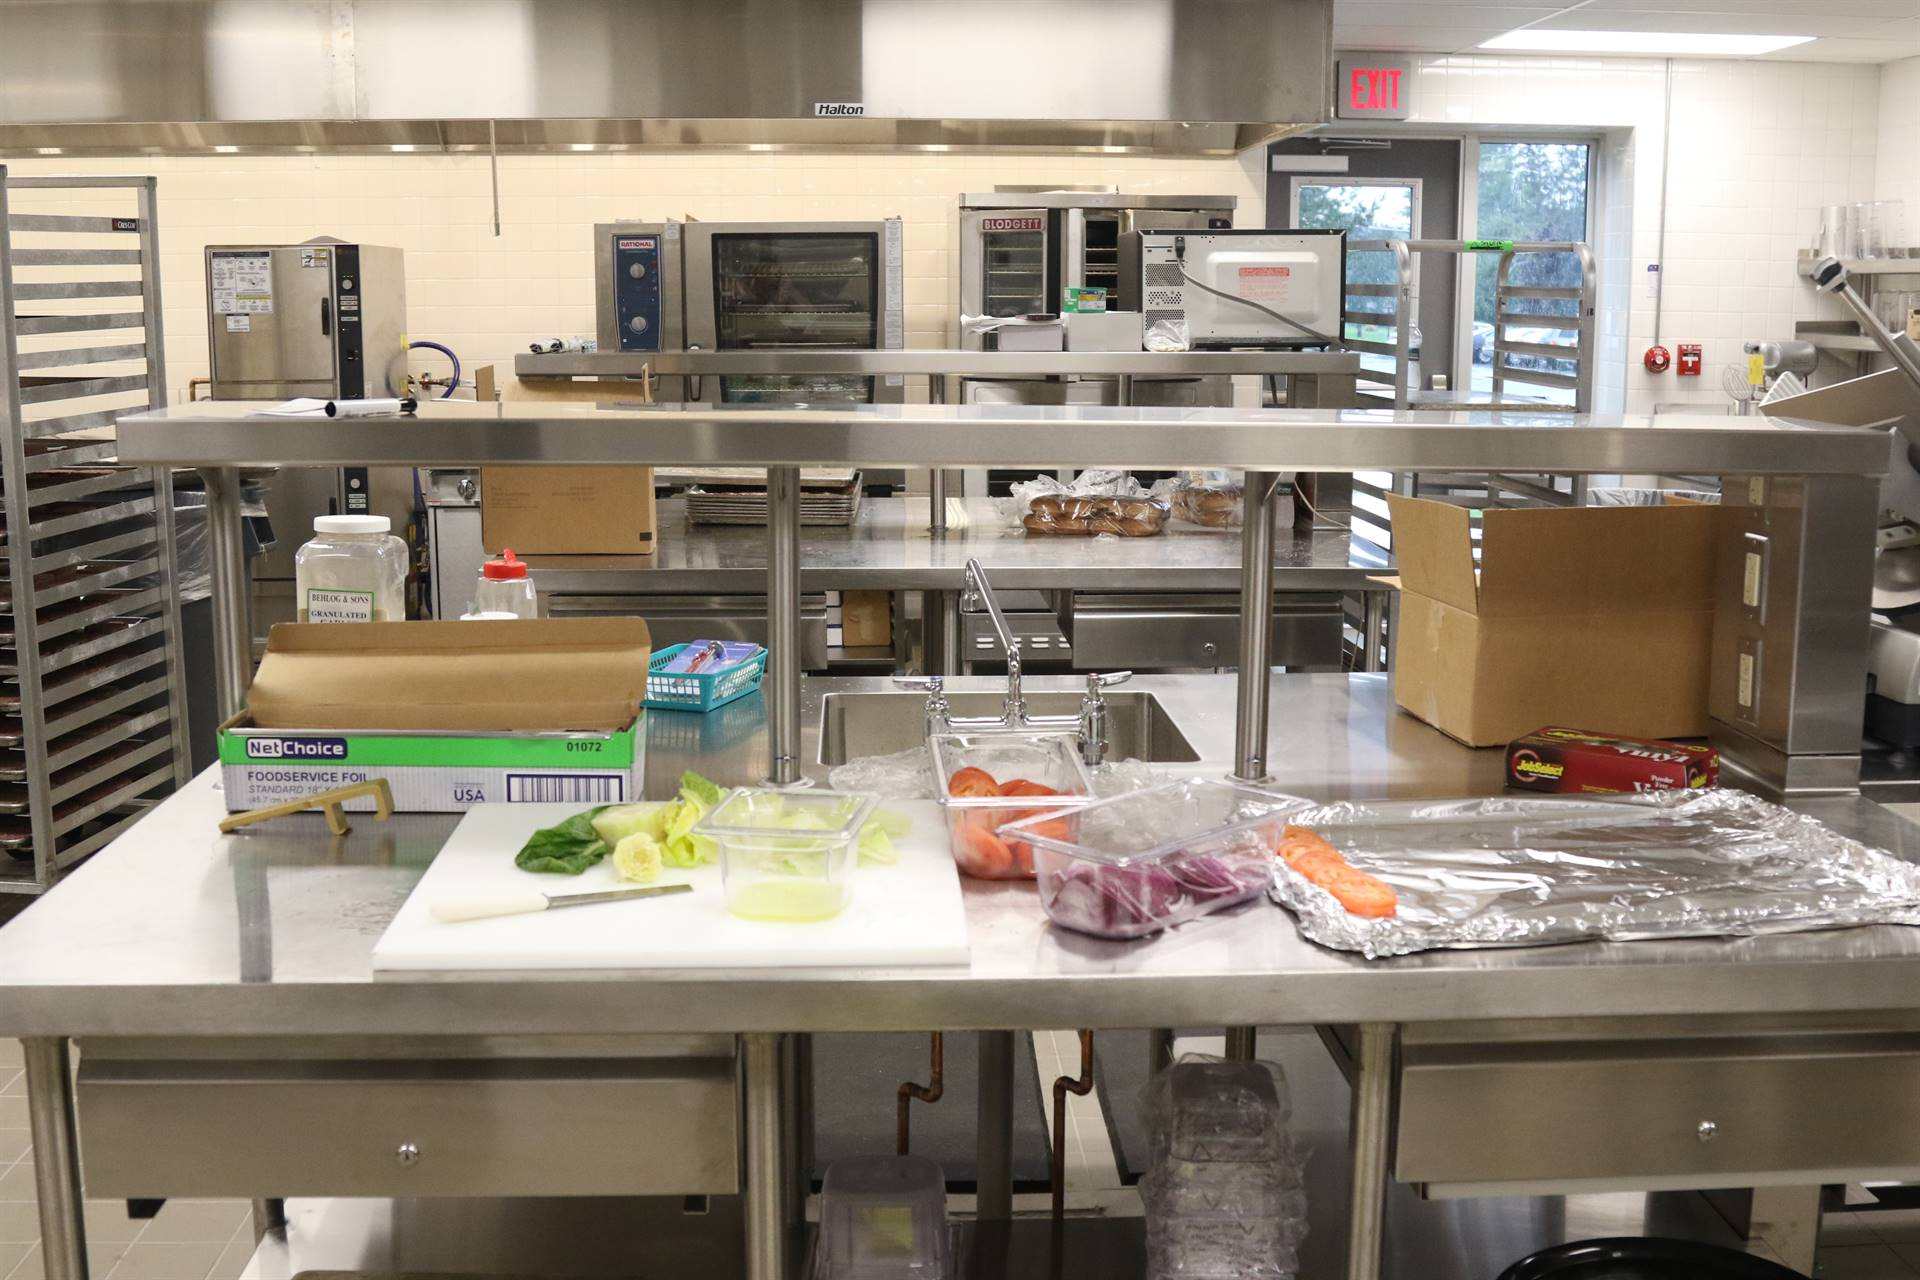 New kitchen at high school